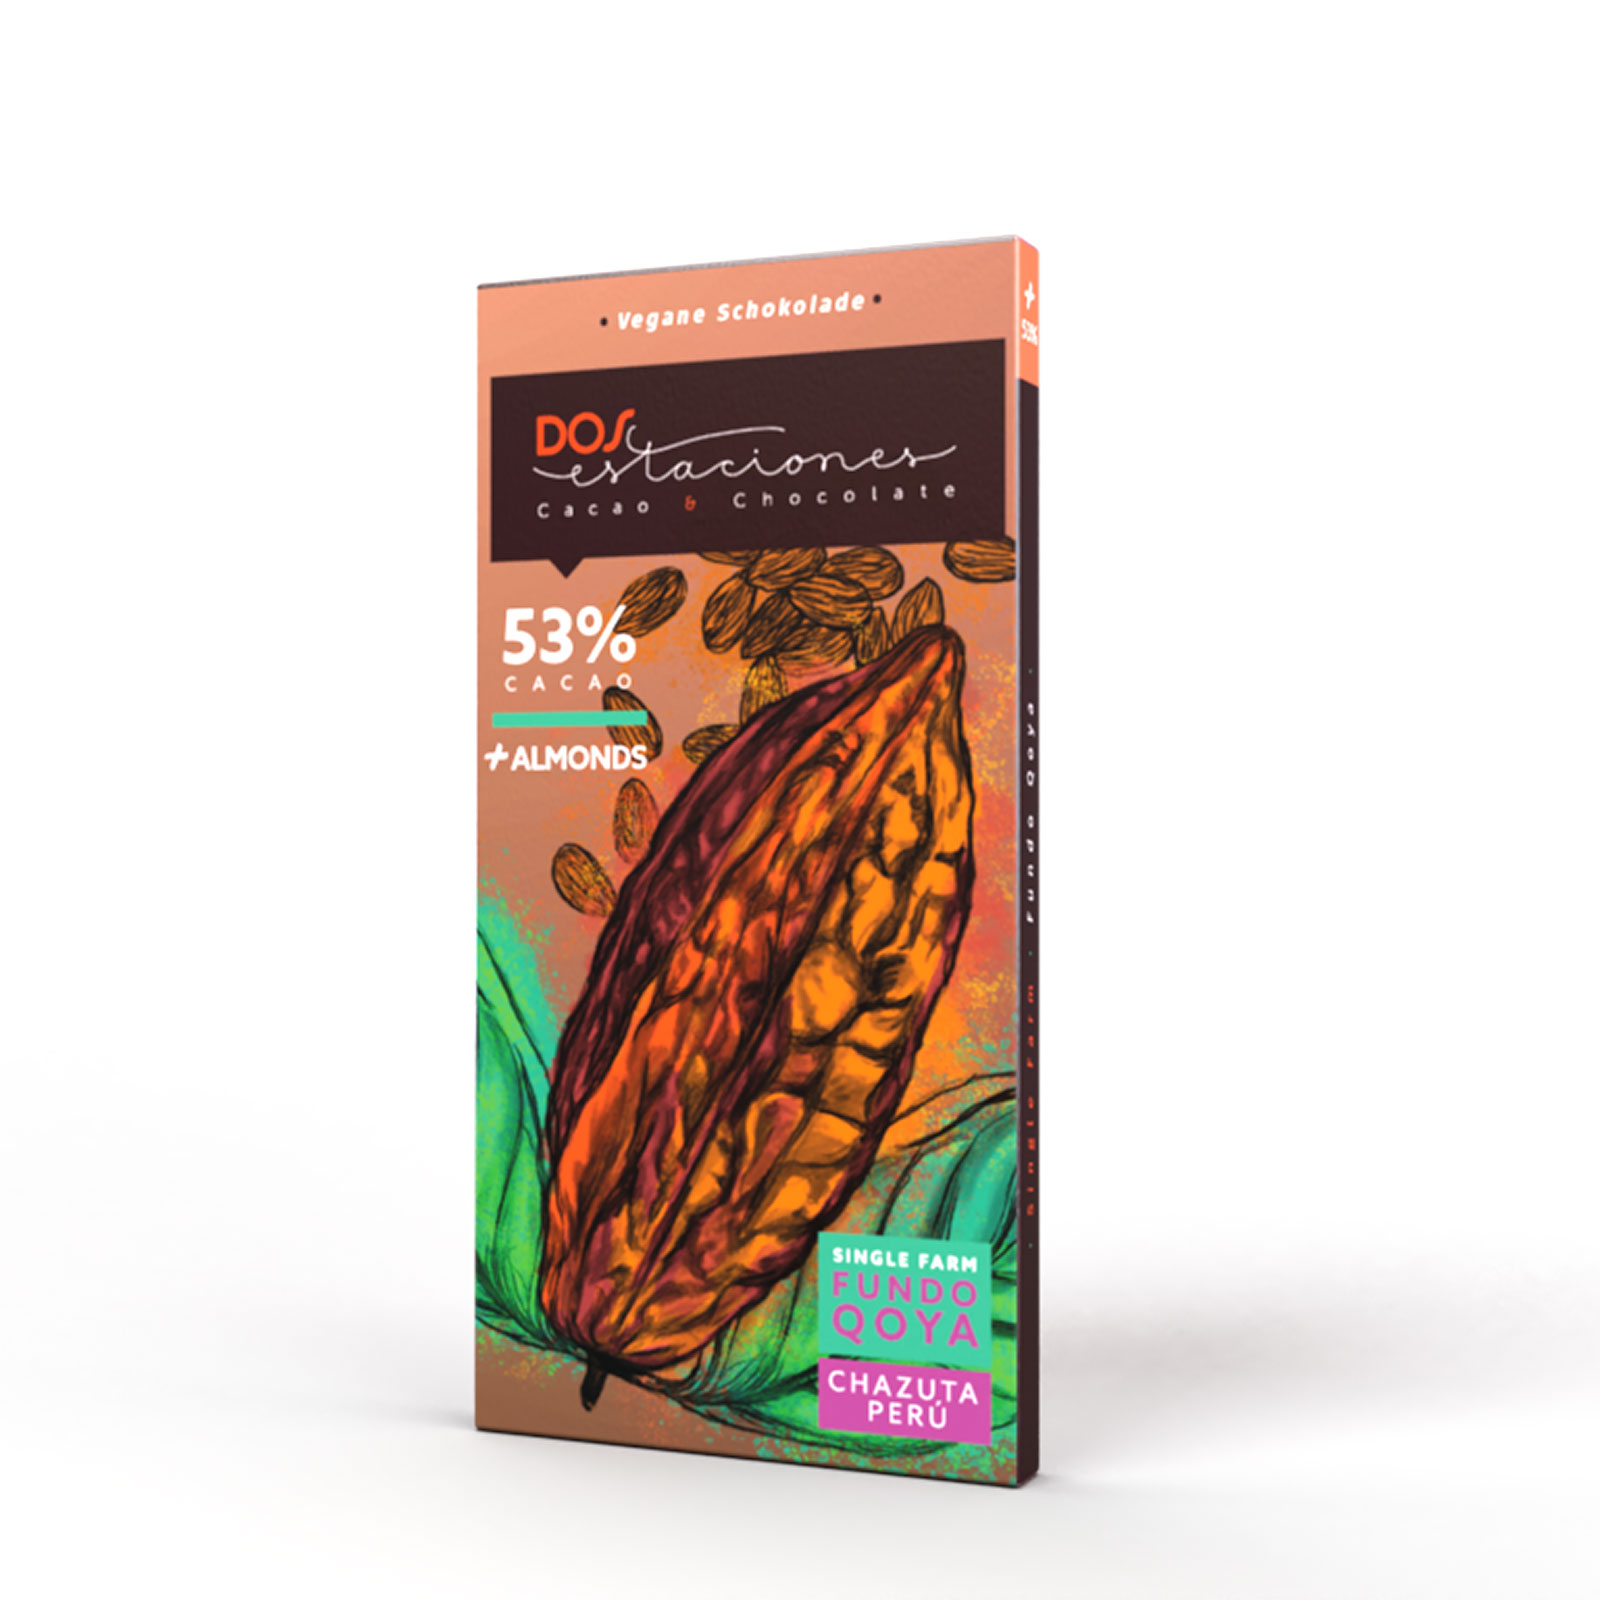 DOS ESTACIONES | Schokolade & Mandeln »Almonds« 53%